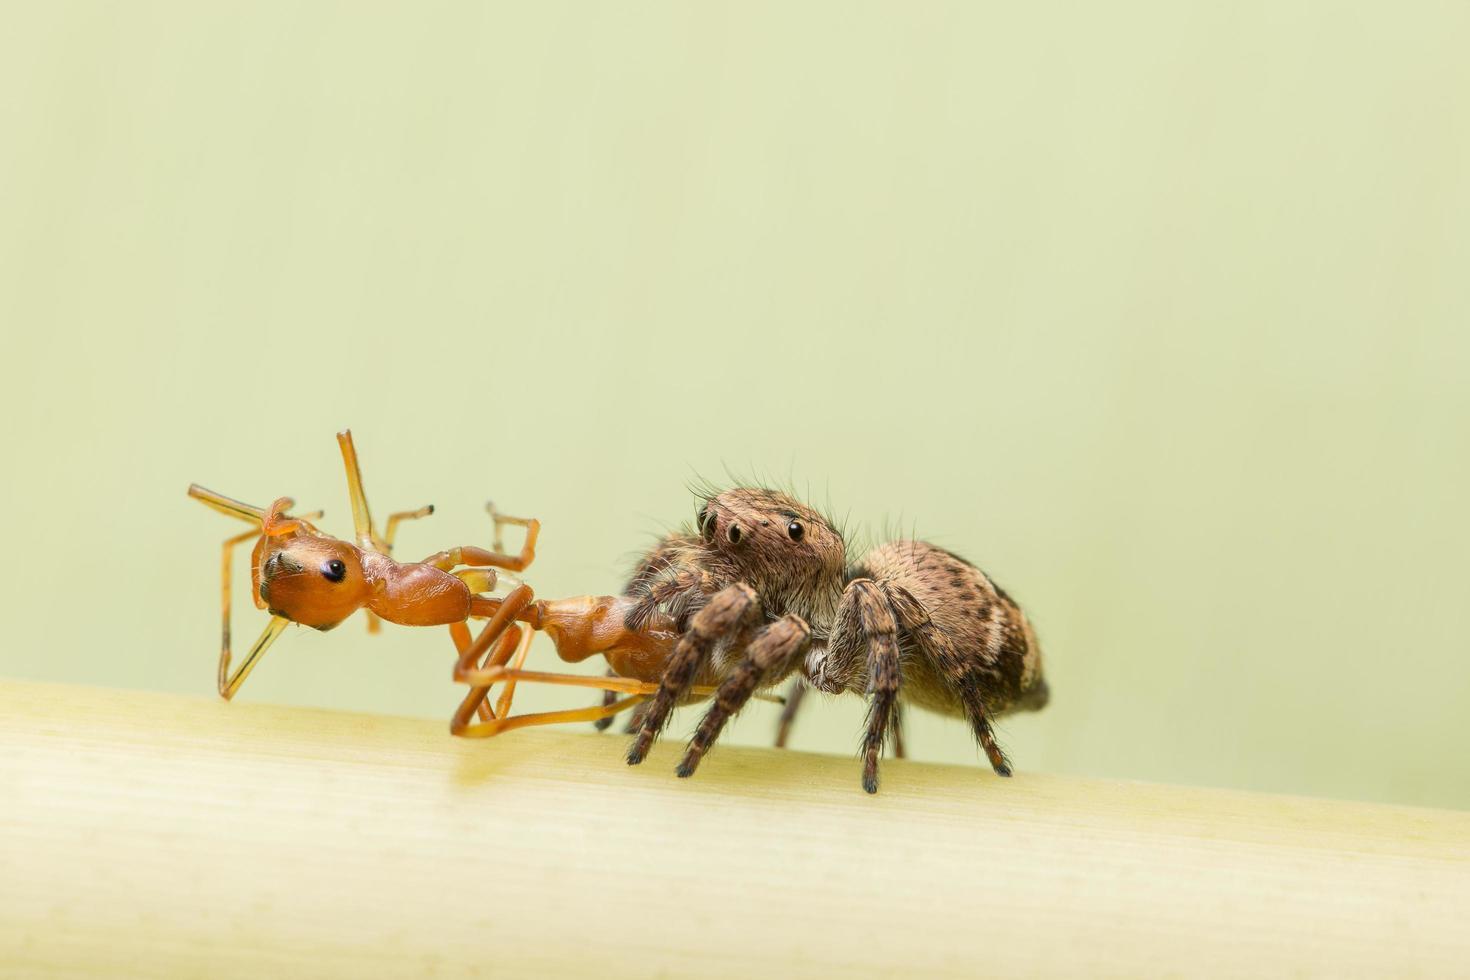 aranha come formiga foto